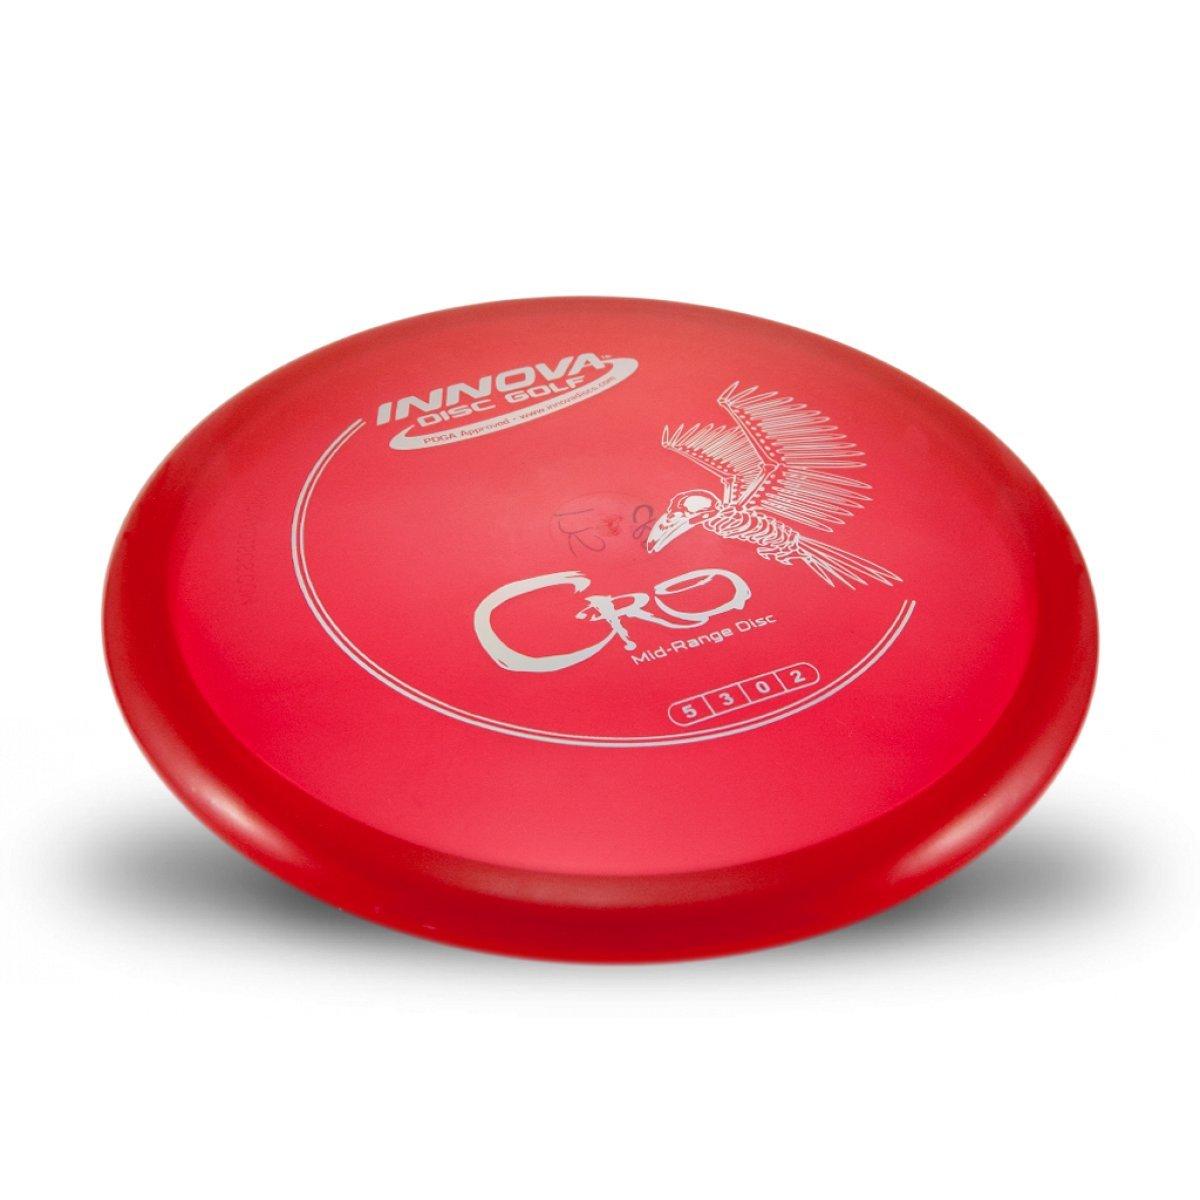 INNOVA Limited Edition Champion Cro Mid-Range Golf Disc [Colors May Vary] - 173-175g